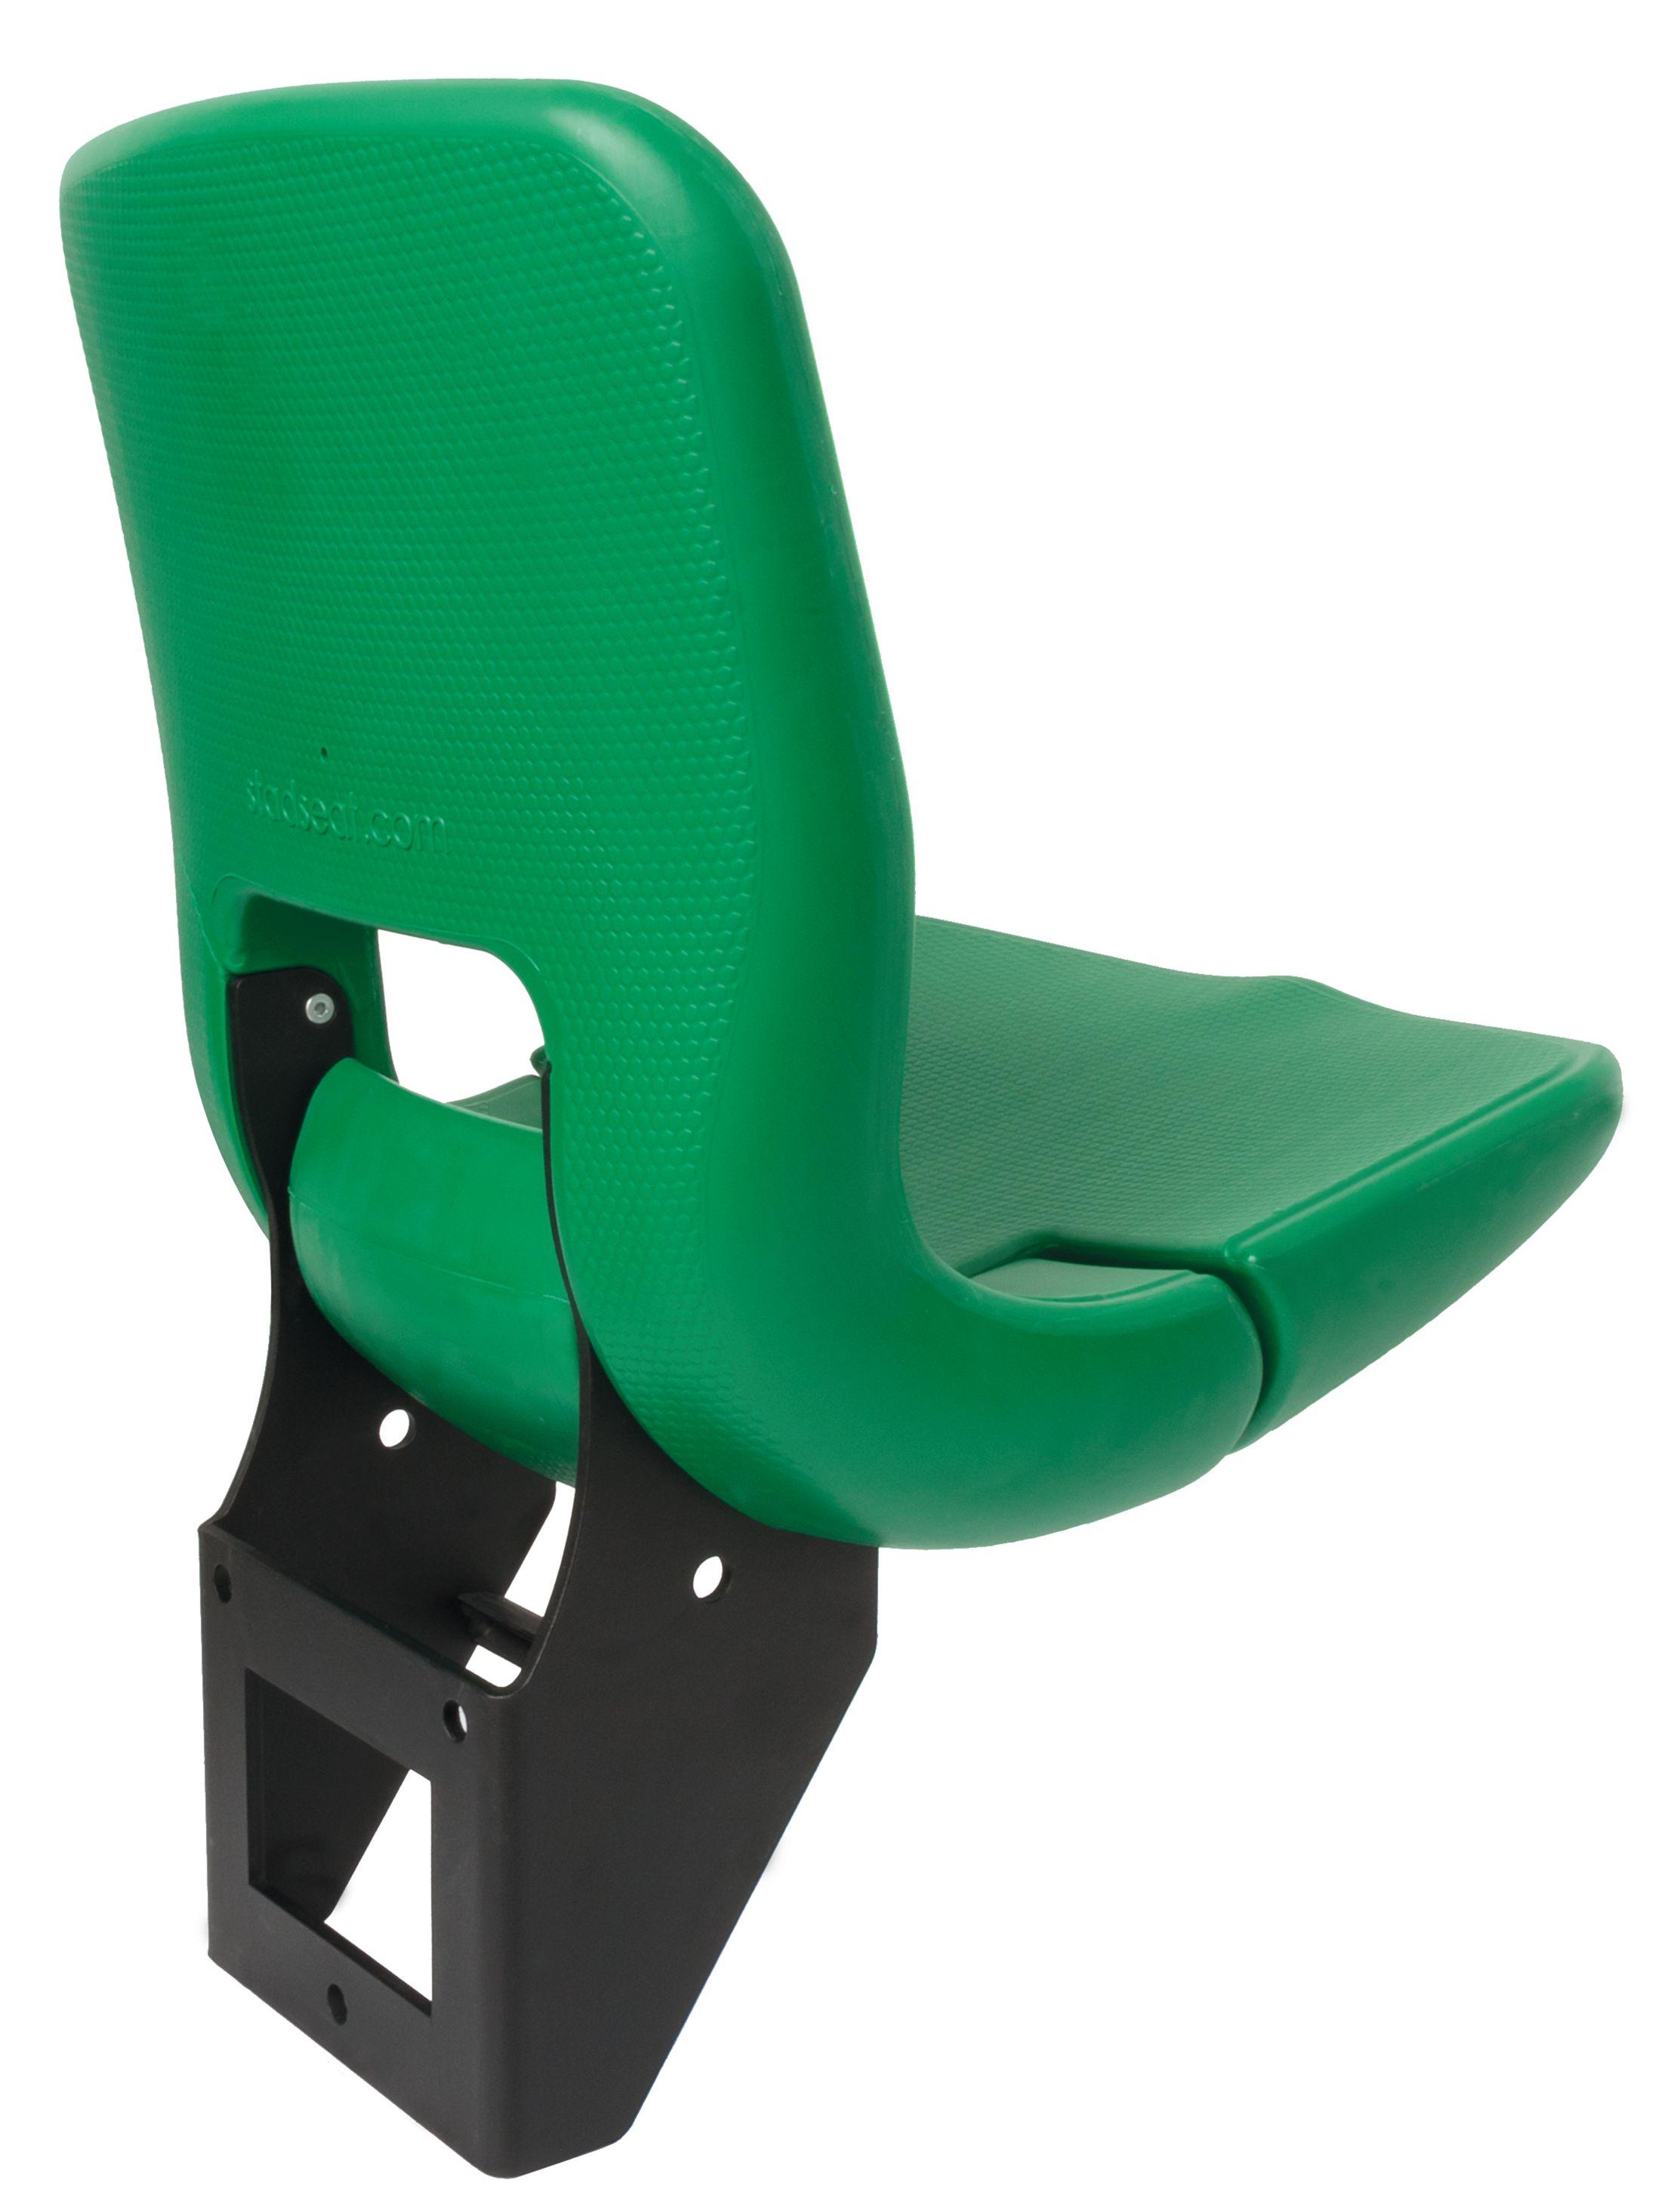 linea_backrest_monoblock_copolymer_pp_stadium_chair_seatorium_25